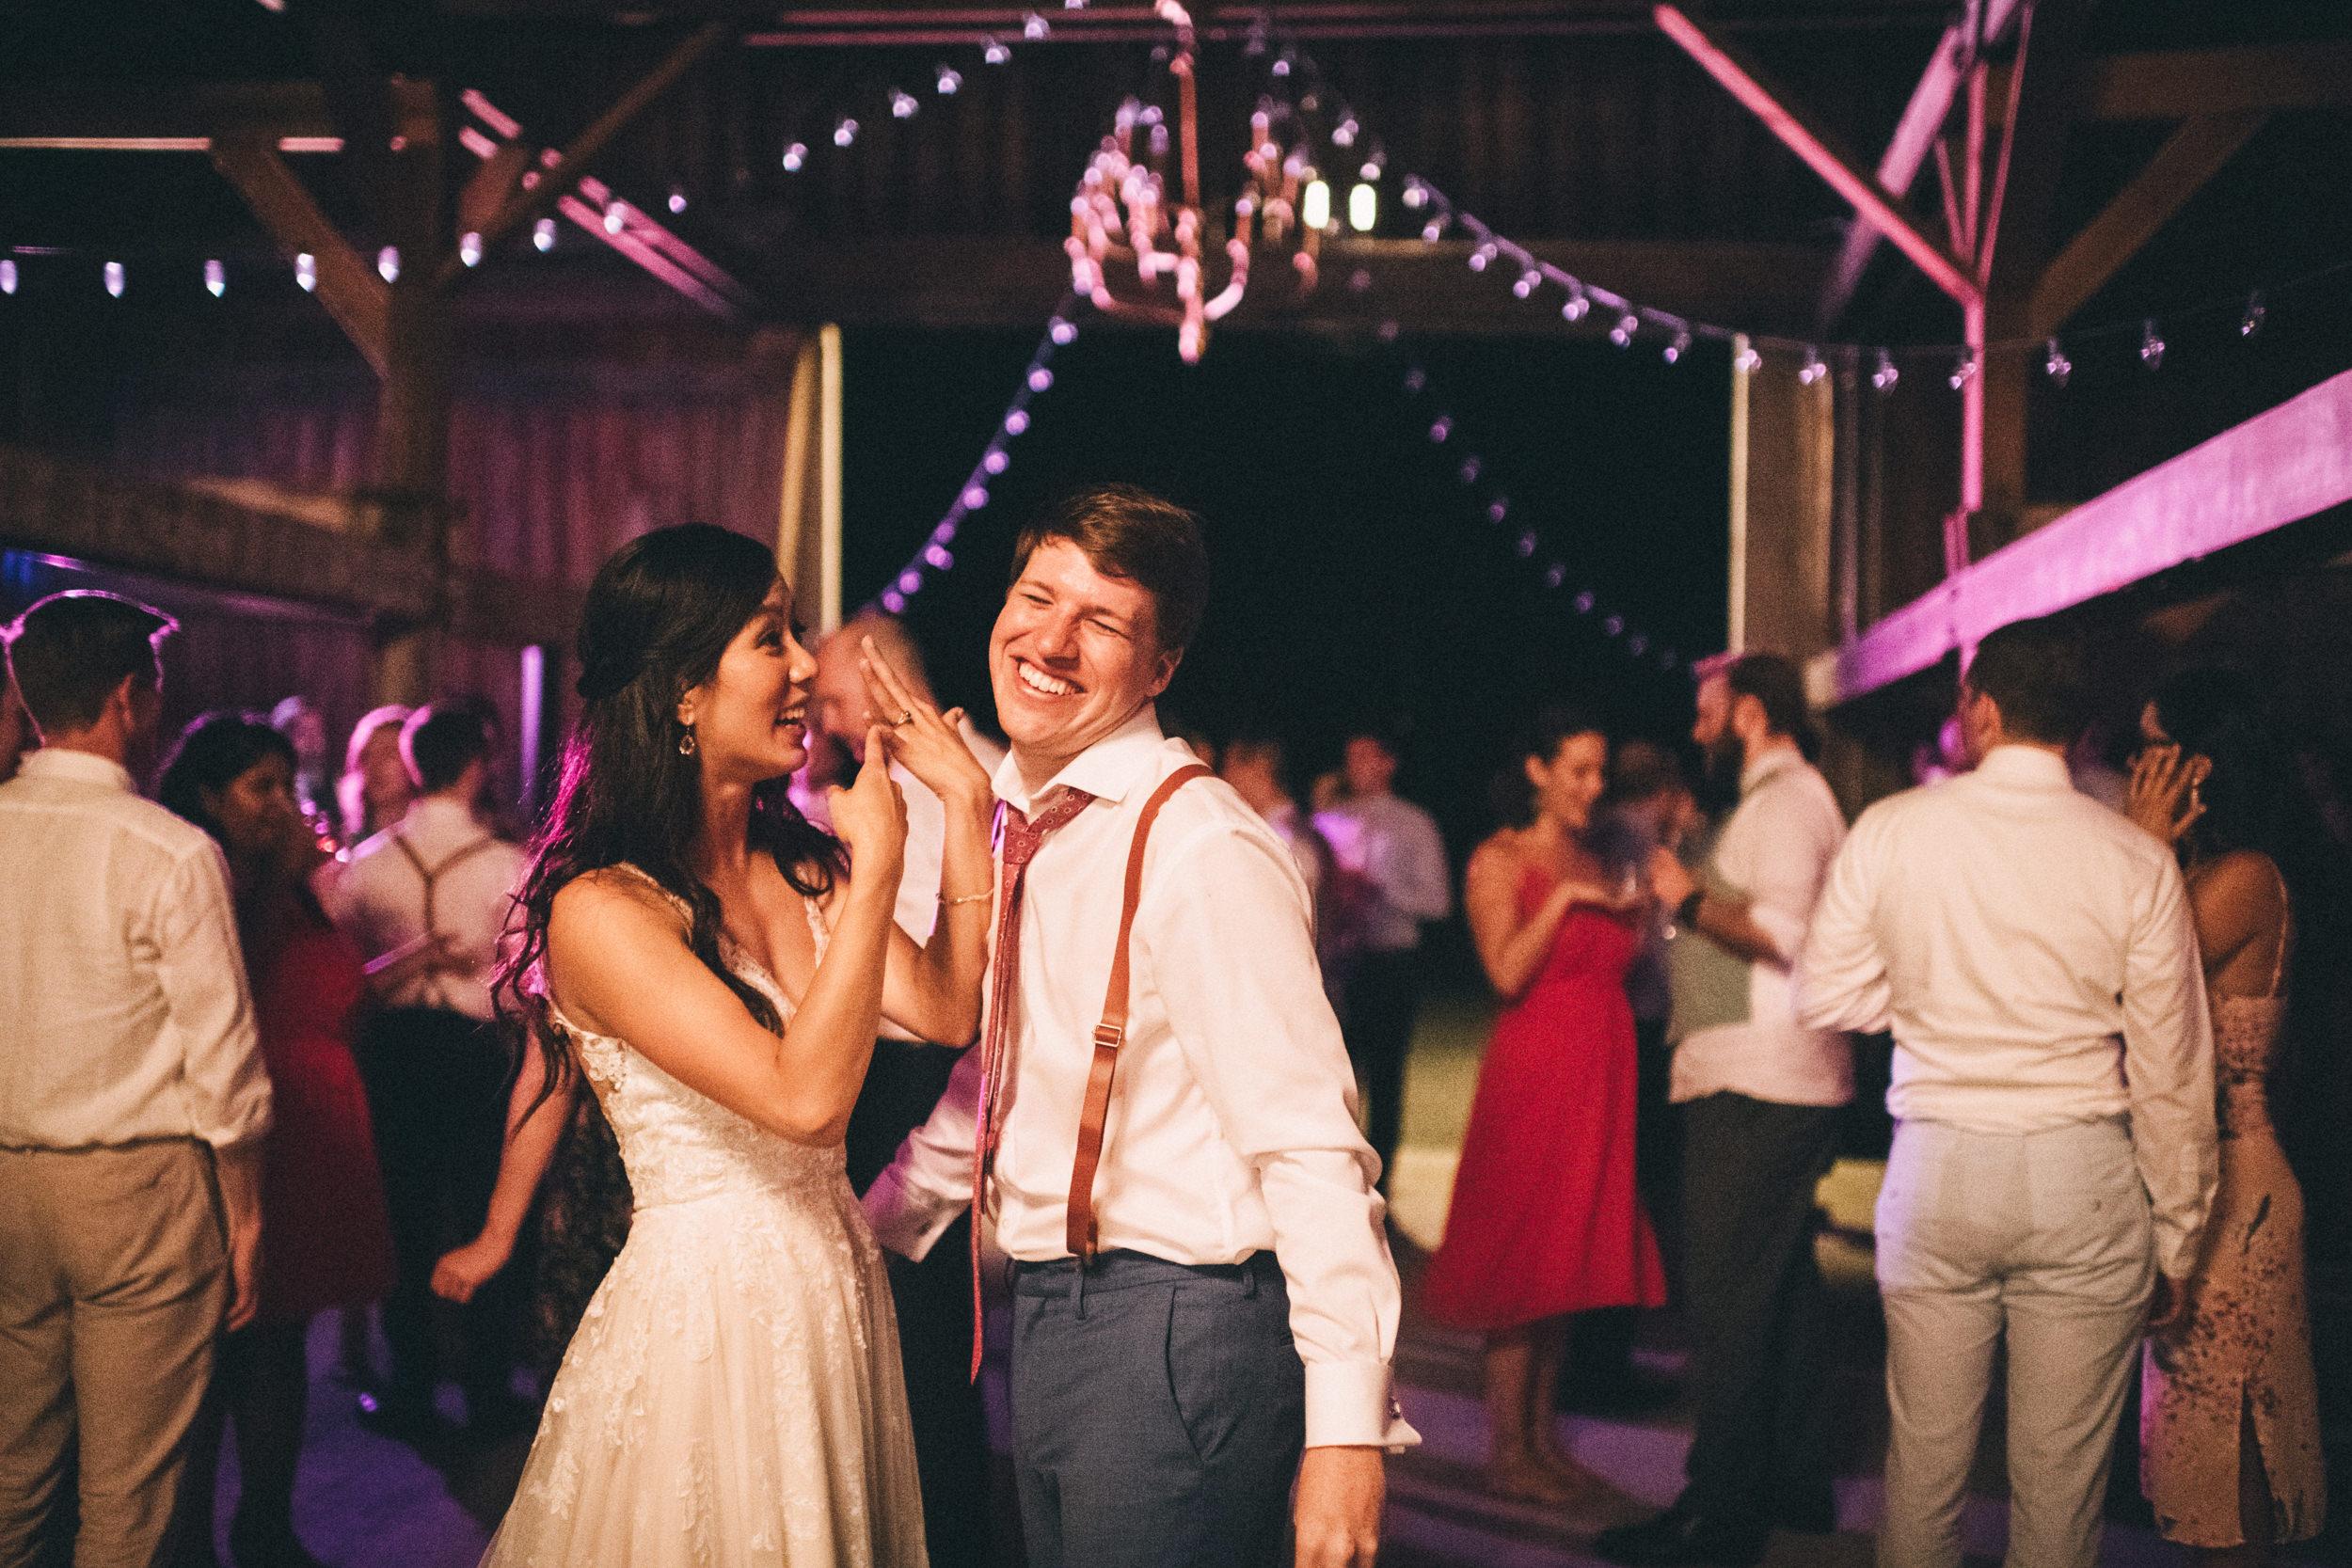 Louisville-Kentucky-Wedding-and-Elopement-Photographer-Sarah-Katherine-Davis-Photography-Summer-Jewel-Toned-Wedding-Chineese-Tea-Ceremony-Warrenwood-Manor-Danville-1108.jpg